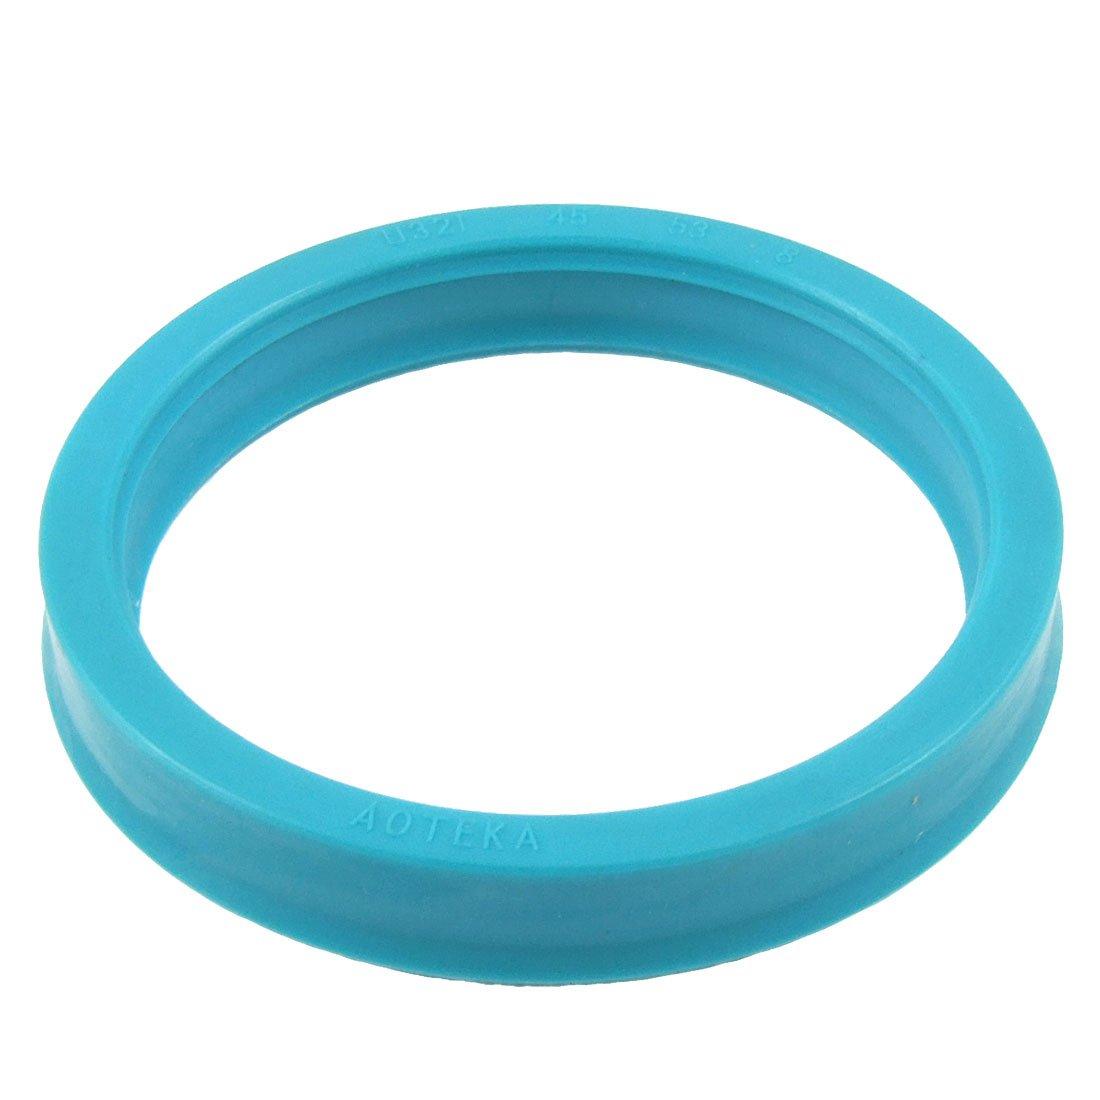 uxcell Single Lip PU Hydraulic Cylinder Oil Seal 45mm x 53mm x 8mm a12011100ux0123